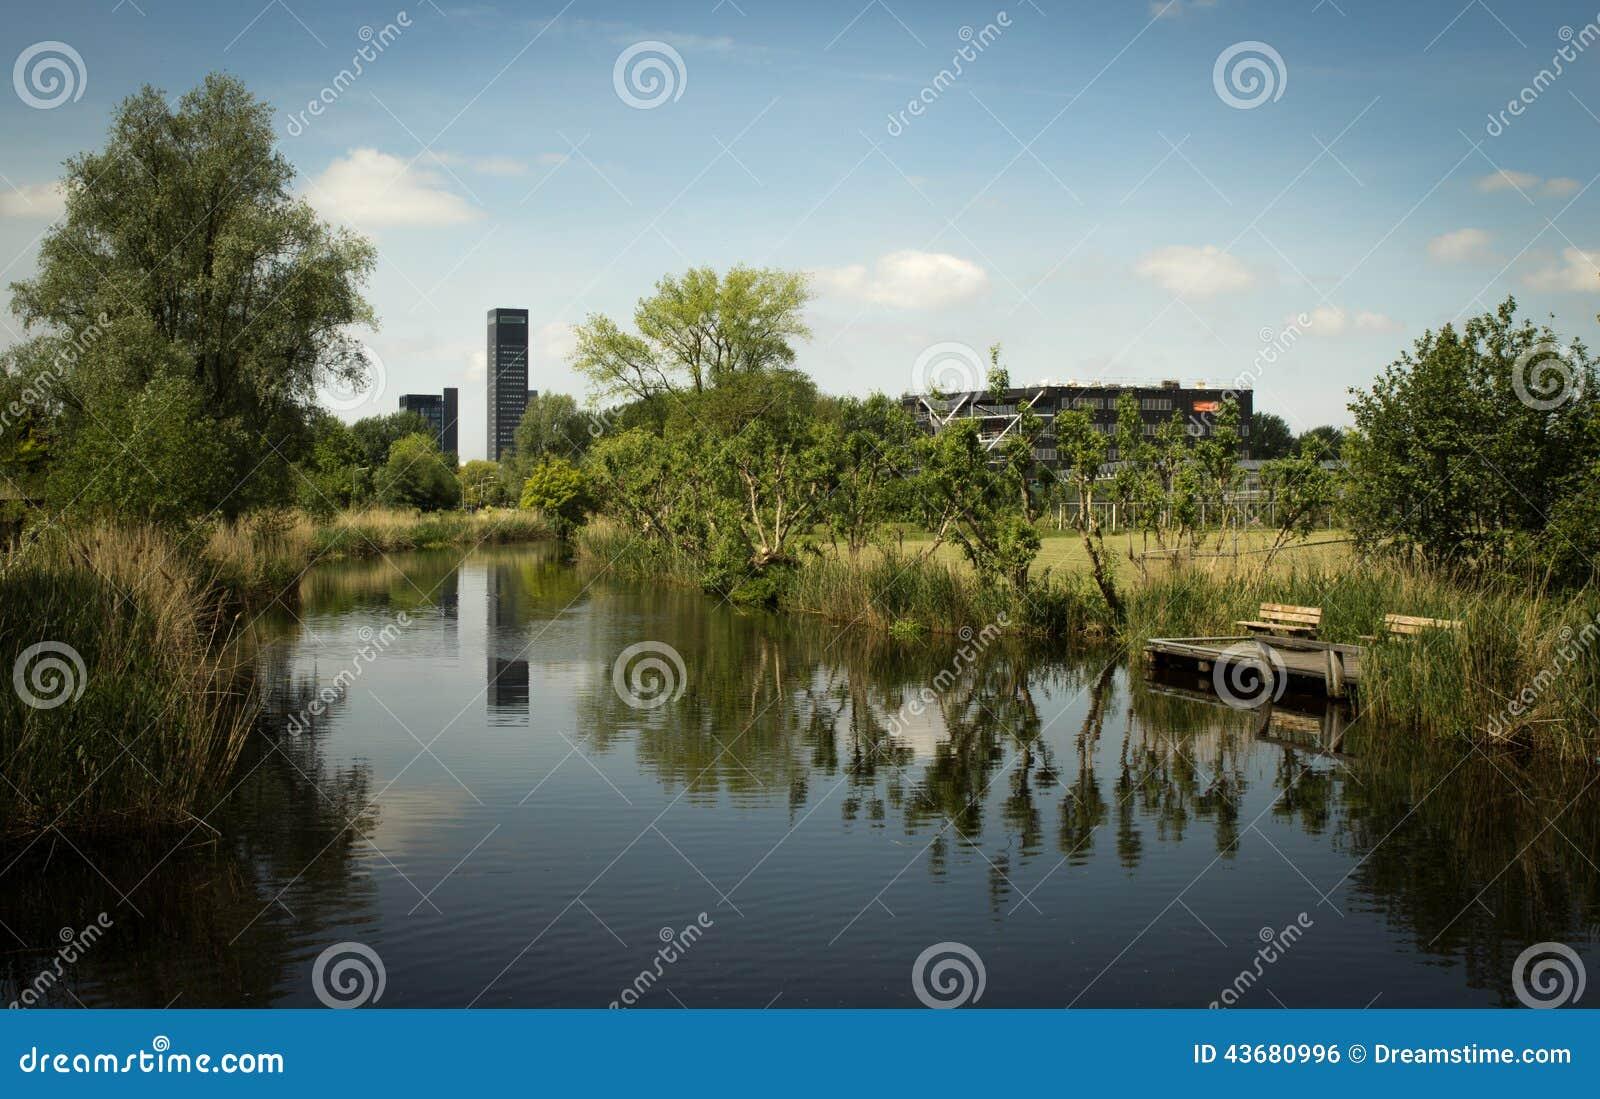 Recreation near Leeuwarden